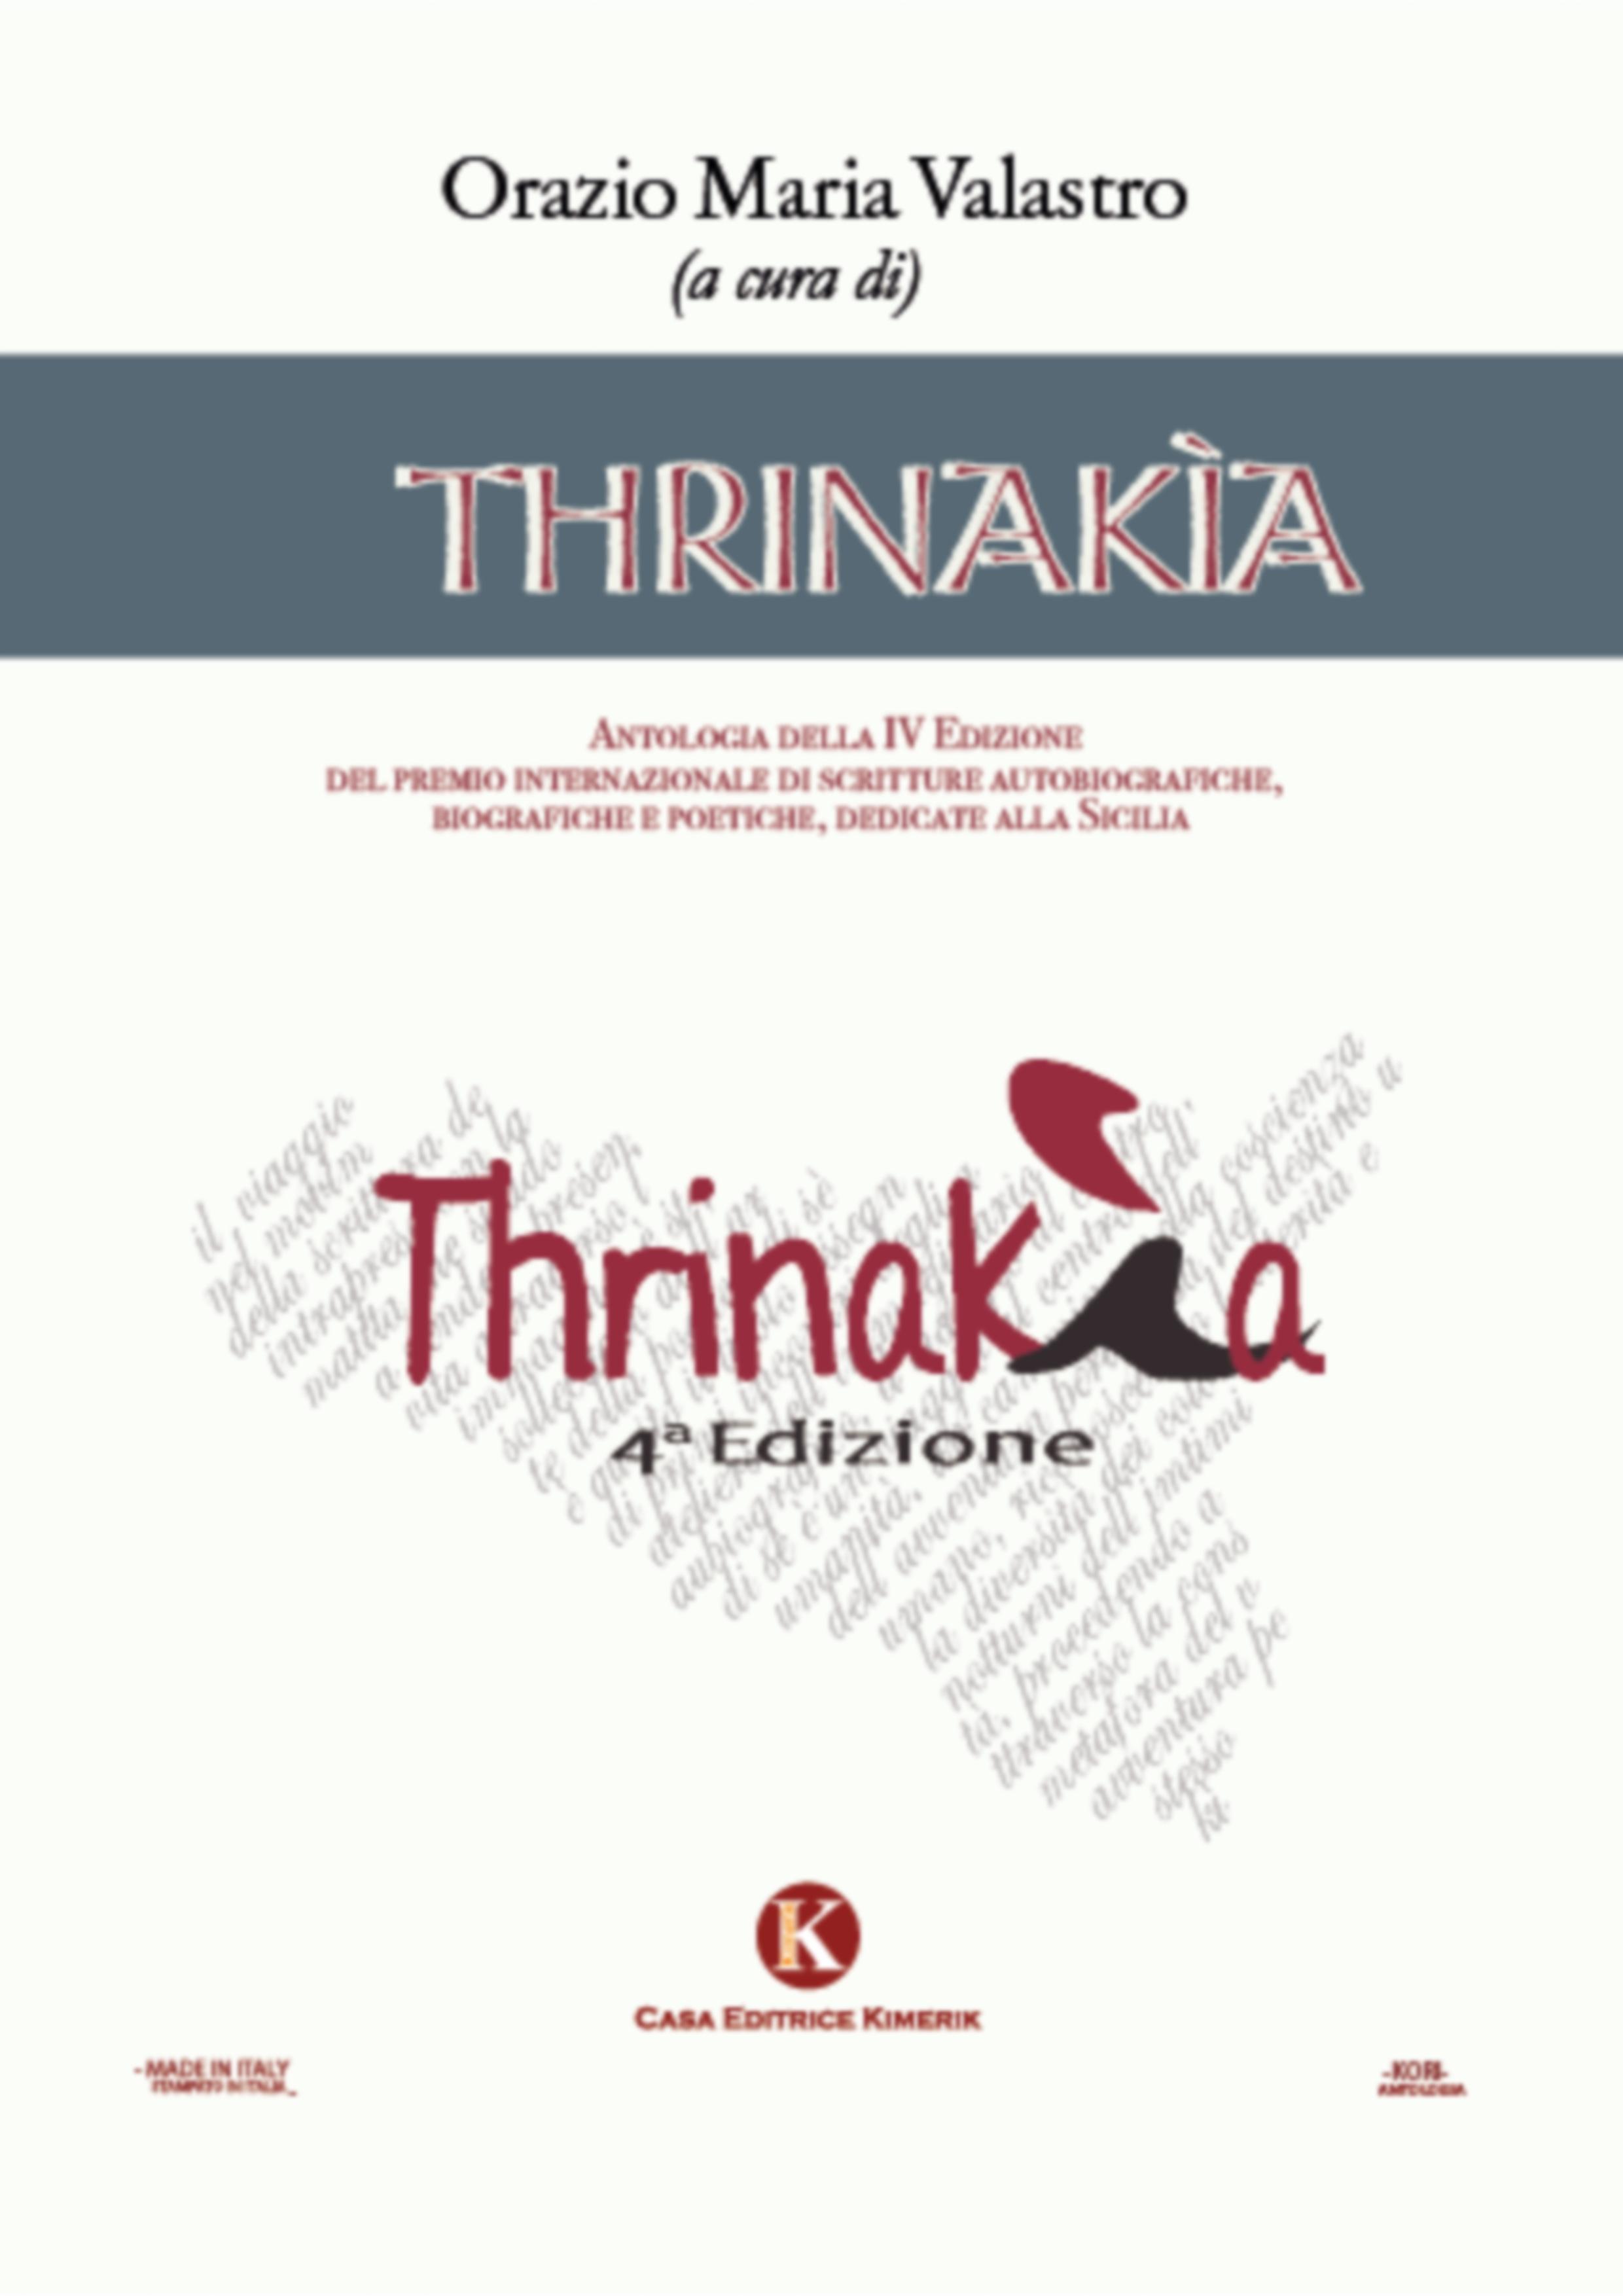 Thrinakìa